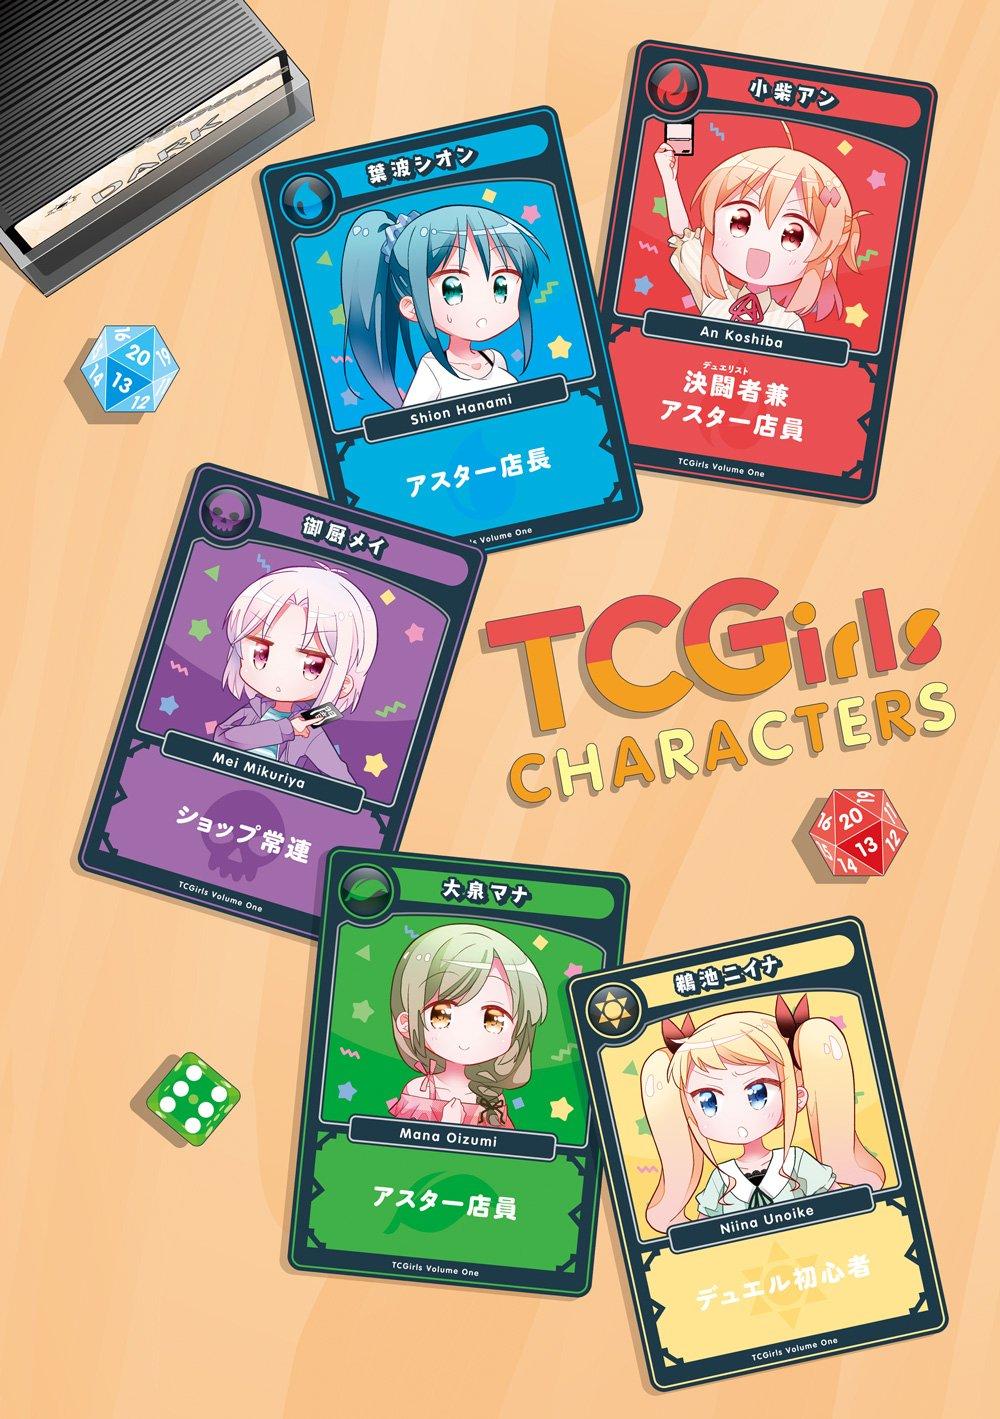 TCGirls キャラ紹介